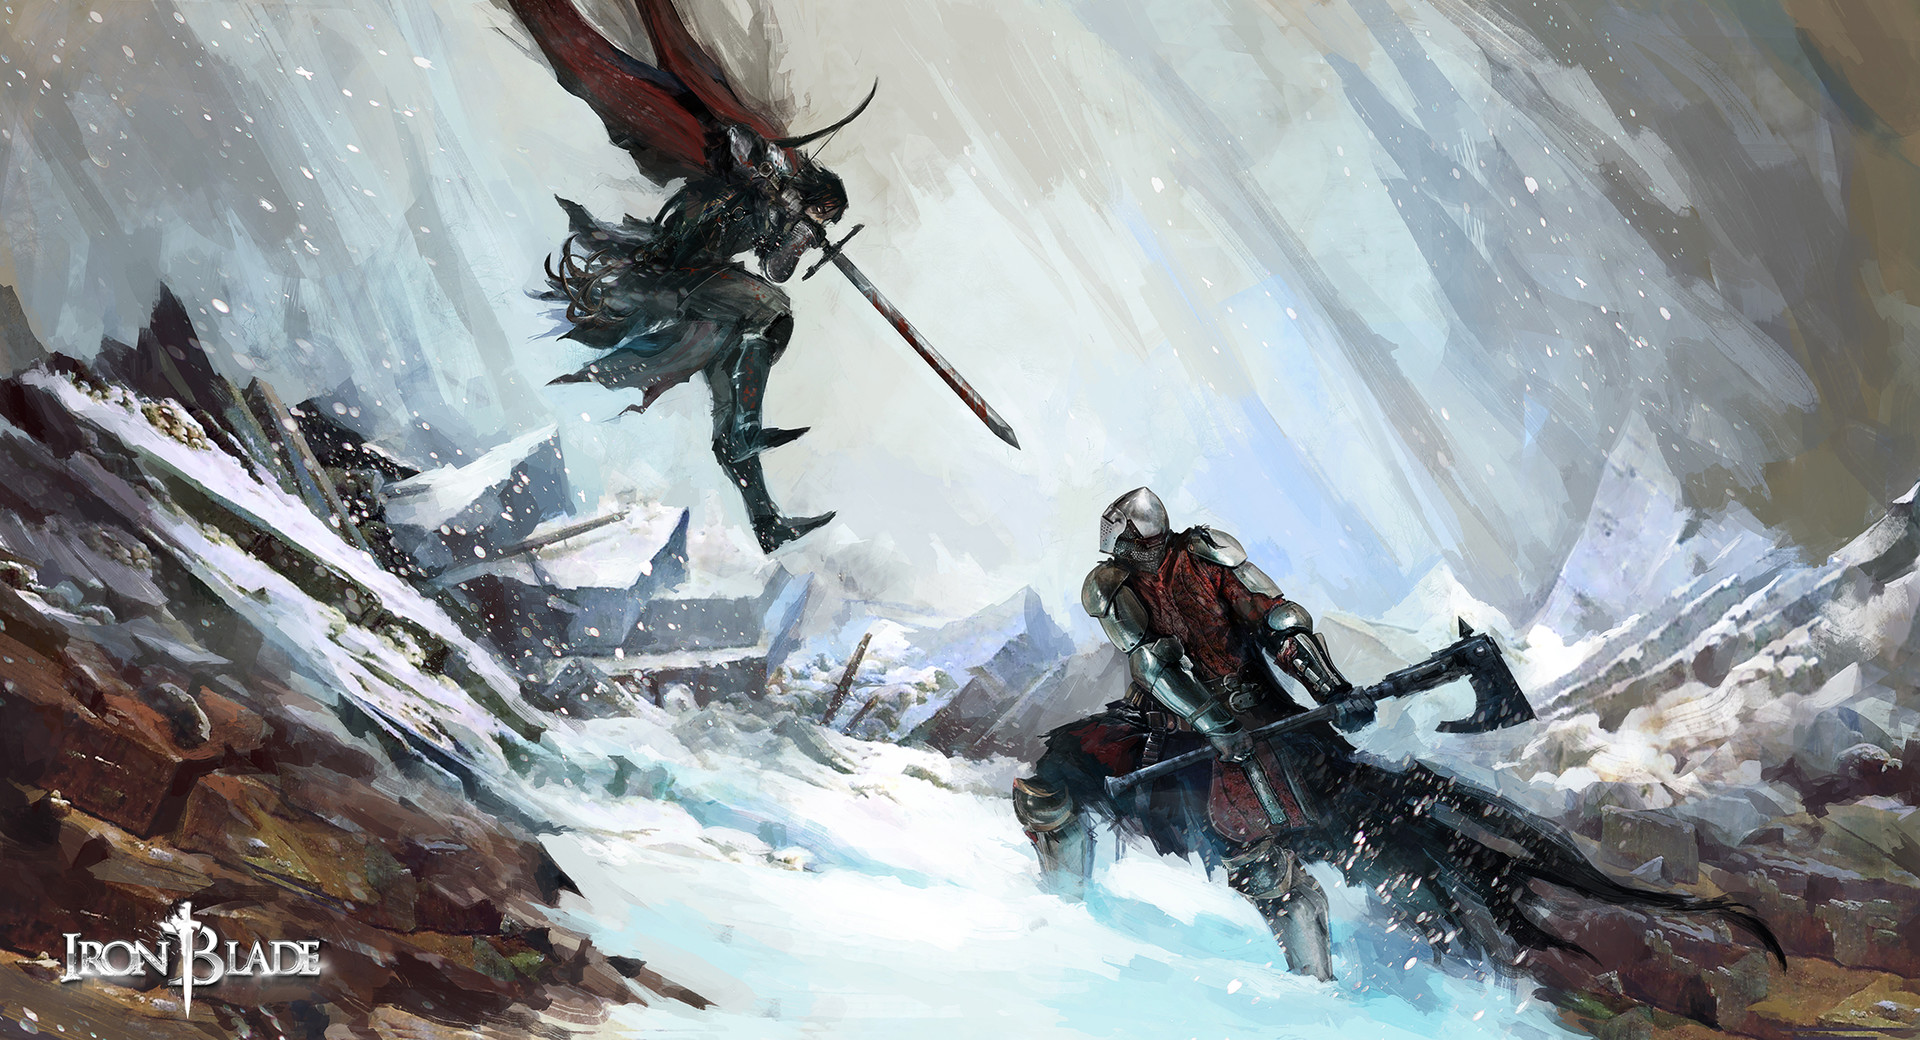 Alexandre chaudret gca characters ennemies situation 13